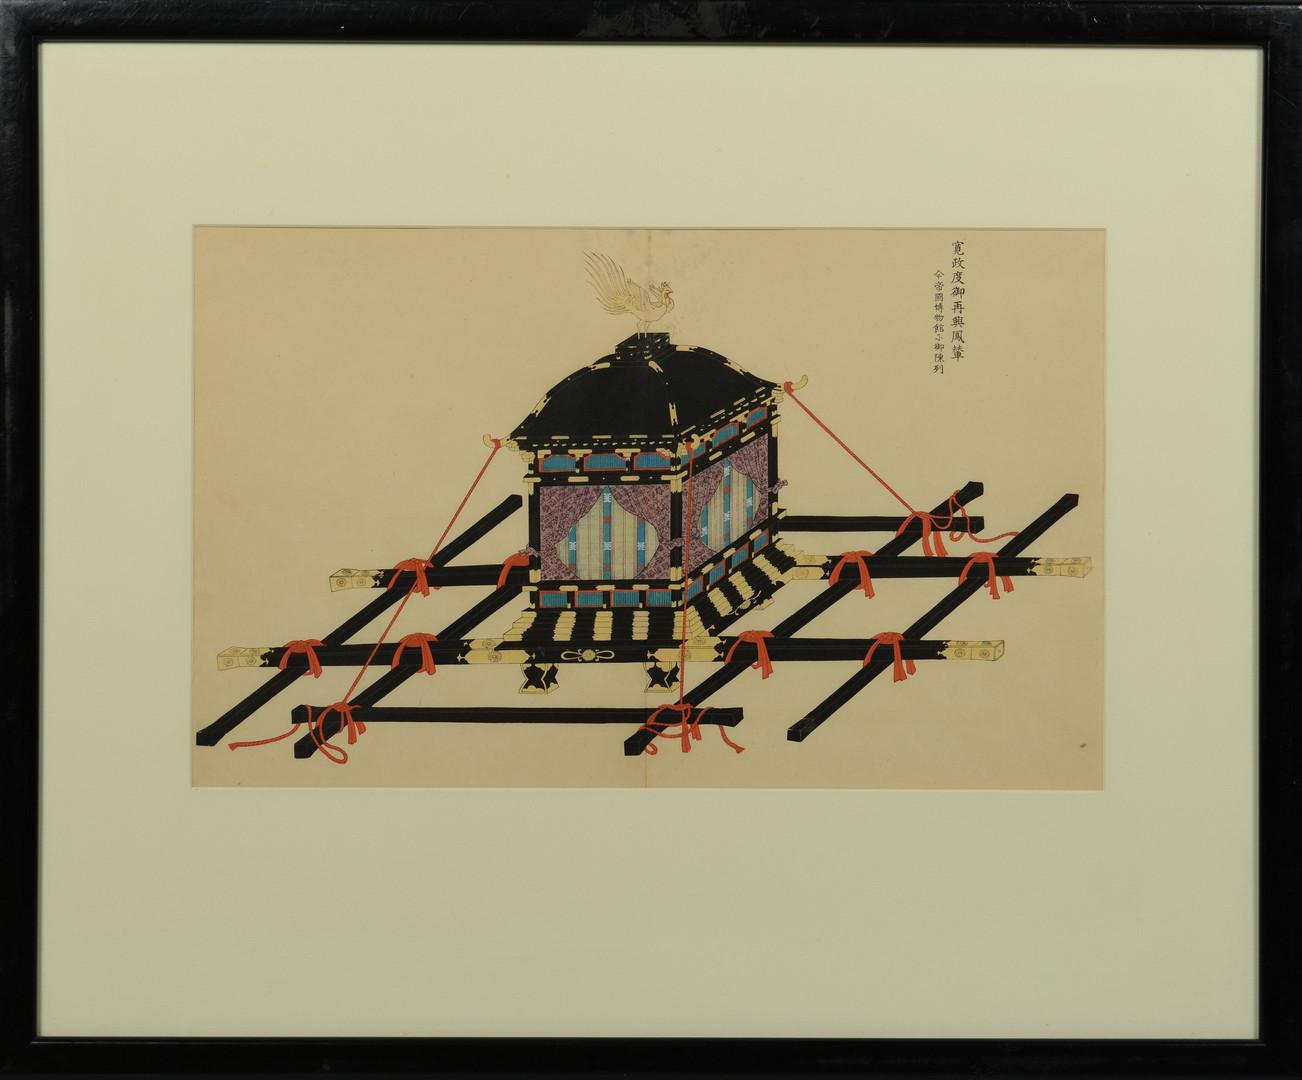 Lot 556: Japanese Gouache – Norimono or sedan chair